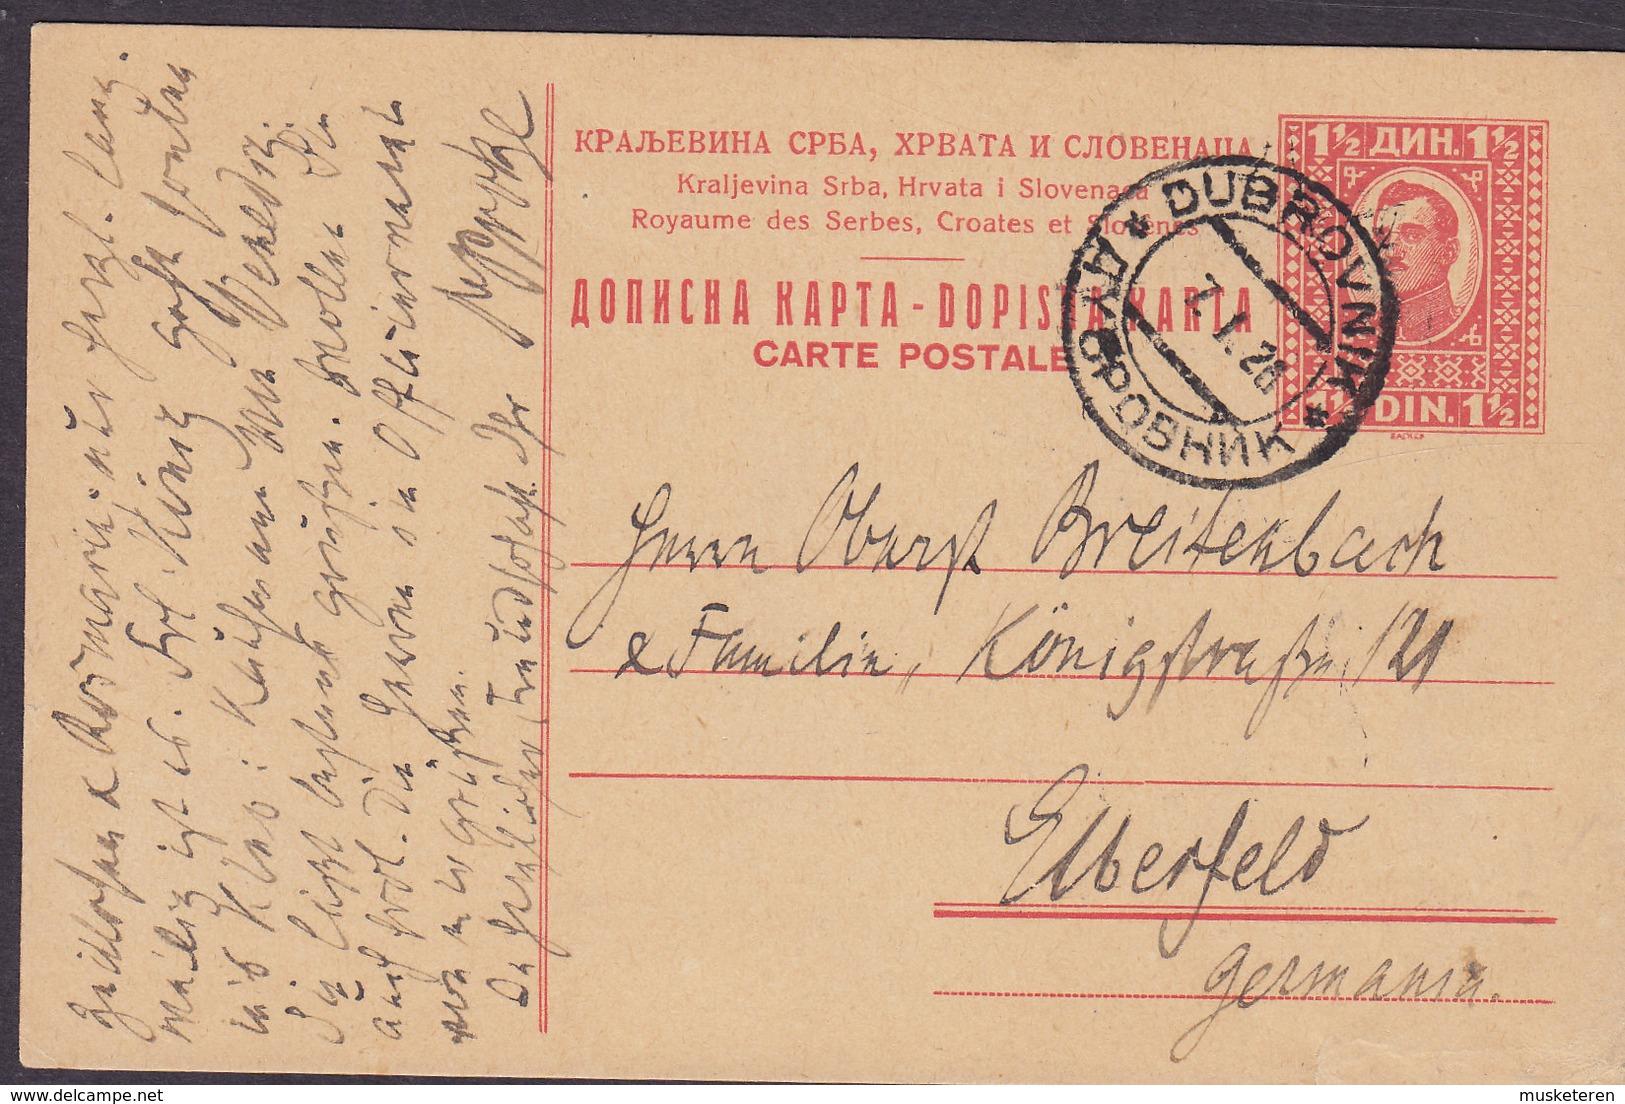 Yugoslavia Postal Stationery Ganzsache Entier 1½ Din König Alexander DUBROVNIK 1926? EBERFELD Germany (2 Scans) - Postal Stationery